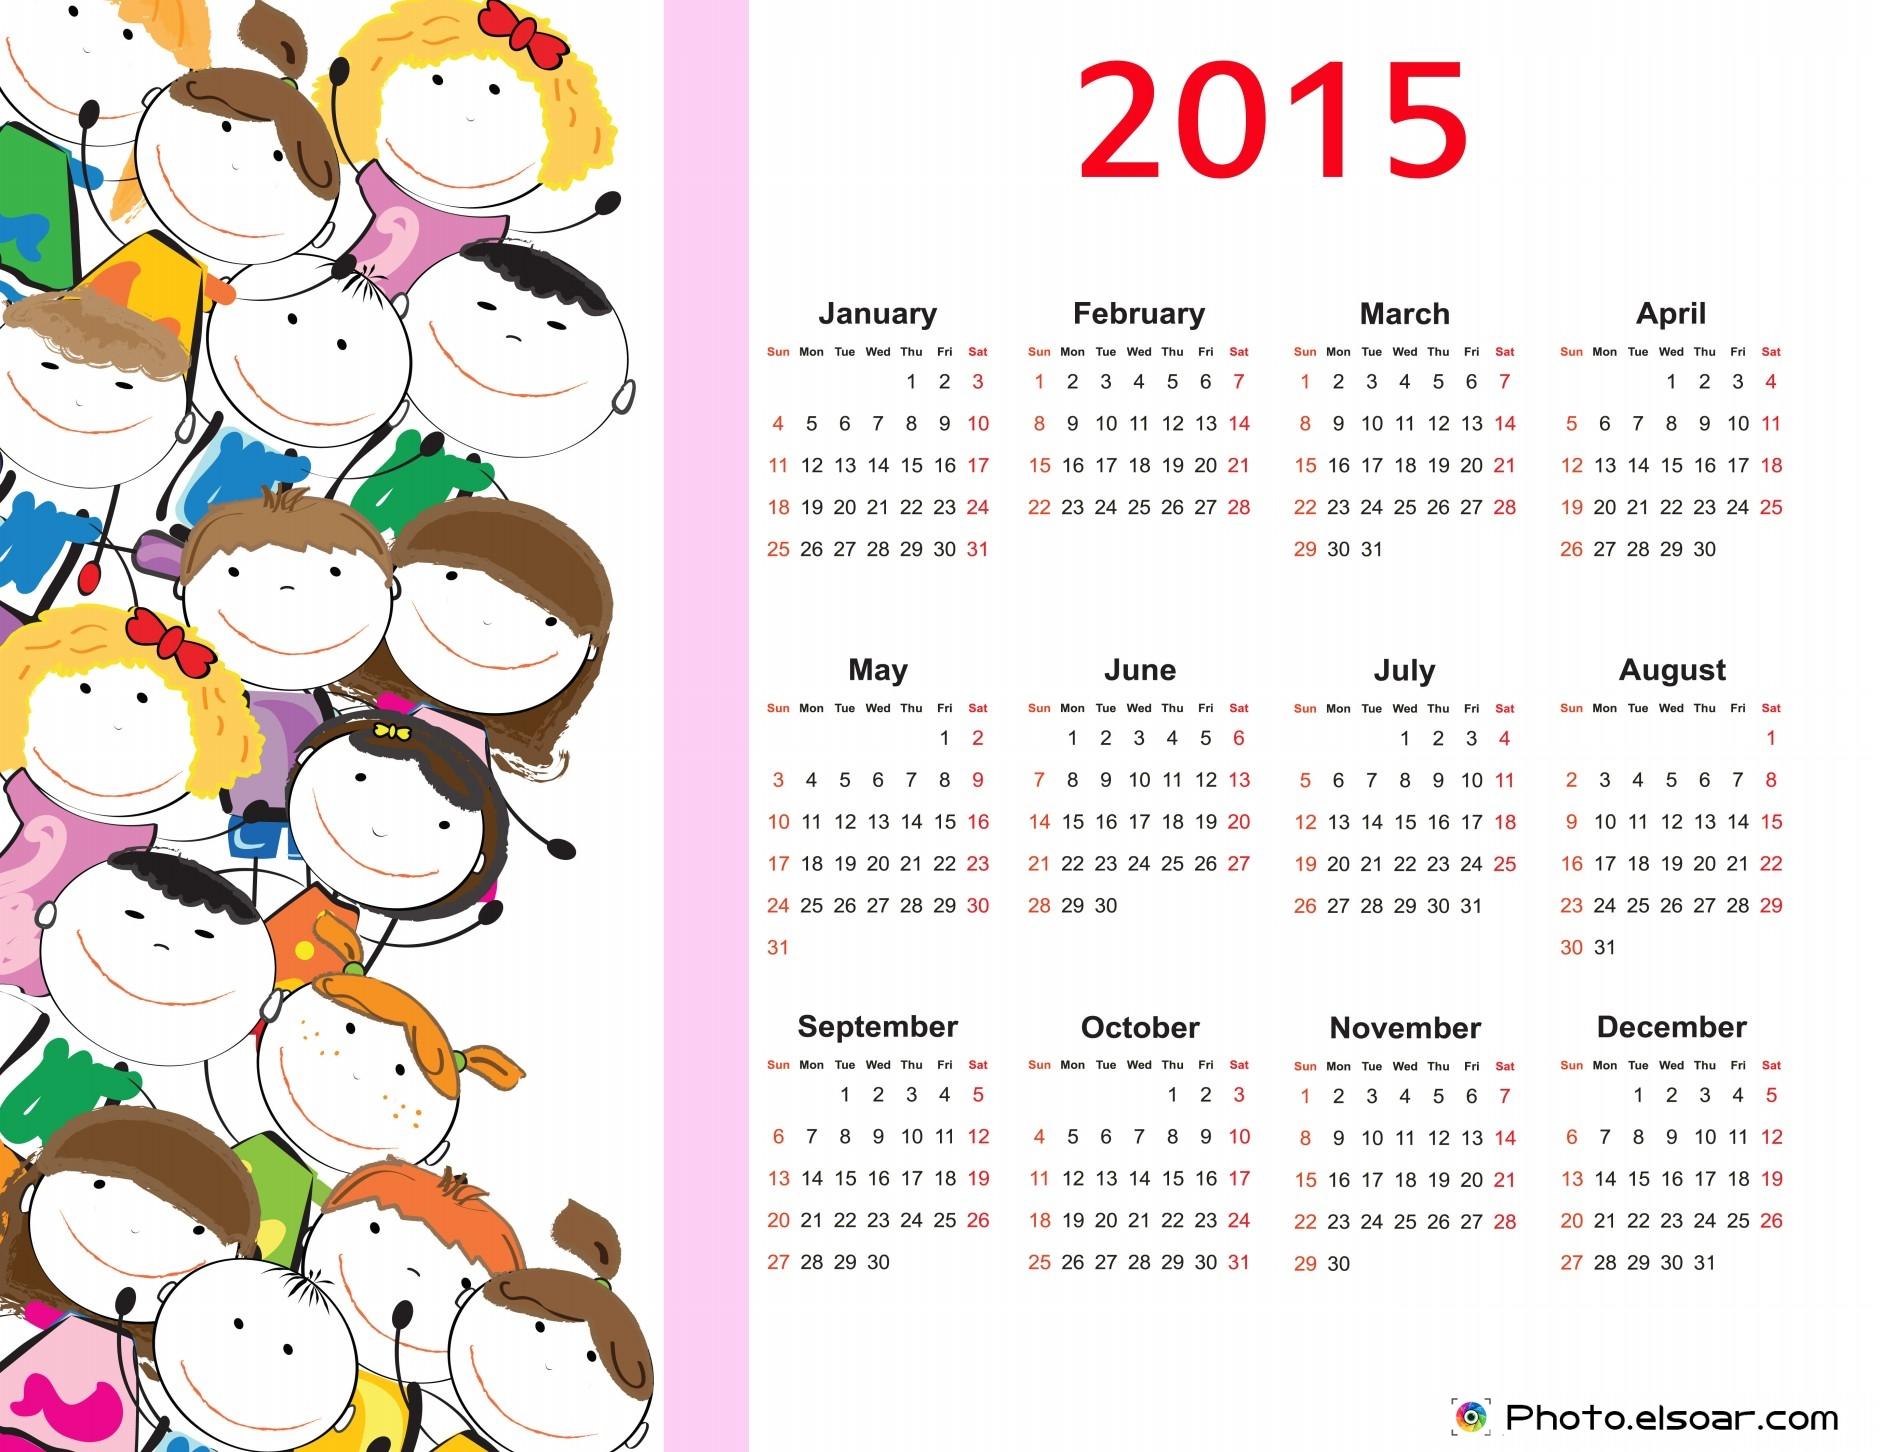 FREE 2015 Calendars...